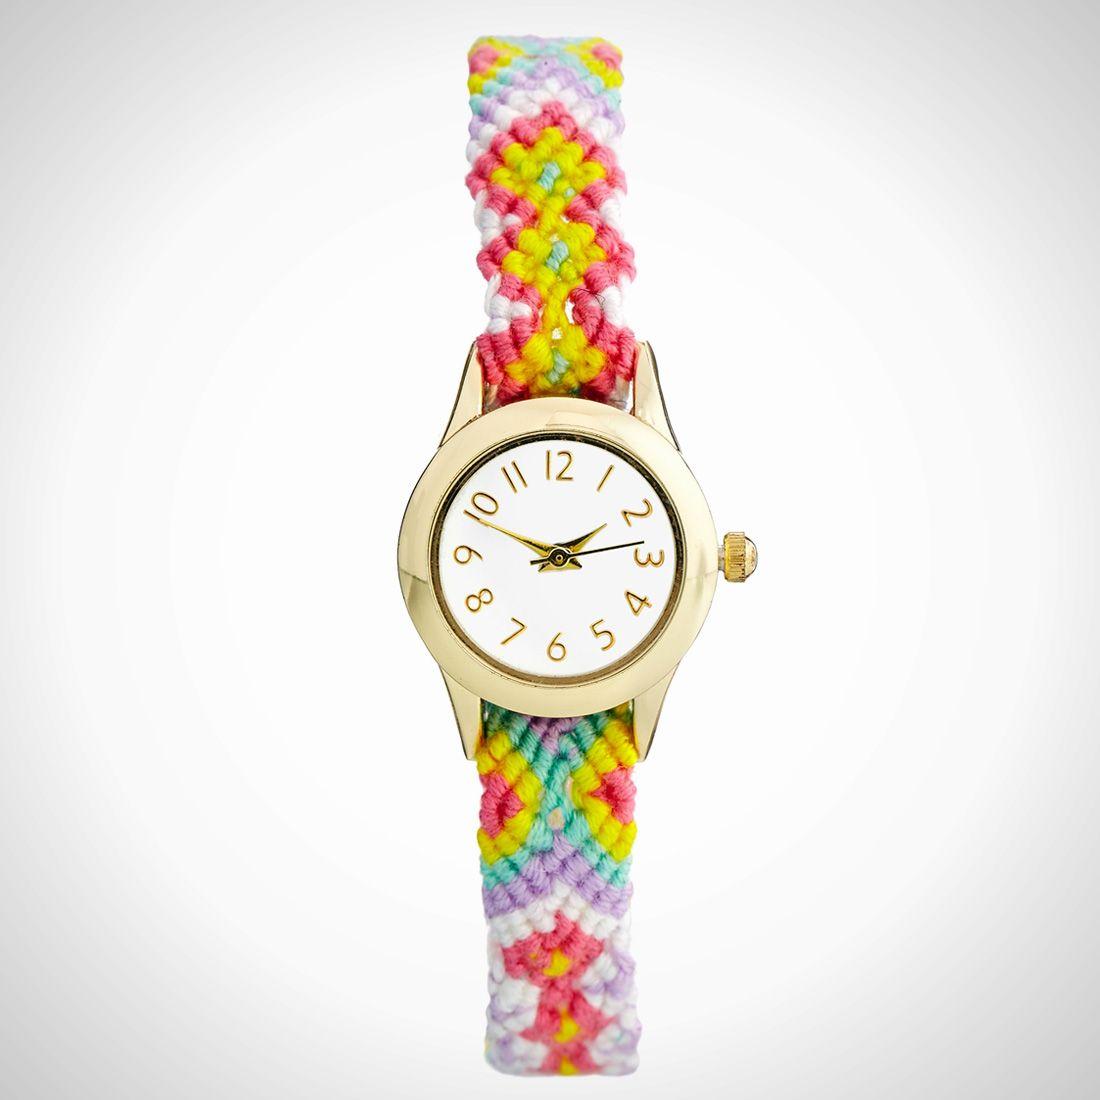 friendship bracelet diy - Sök på Google